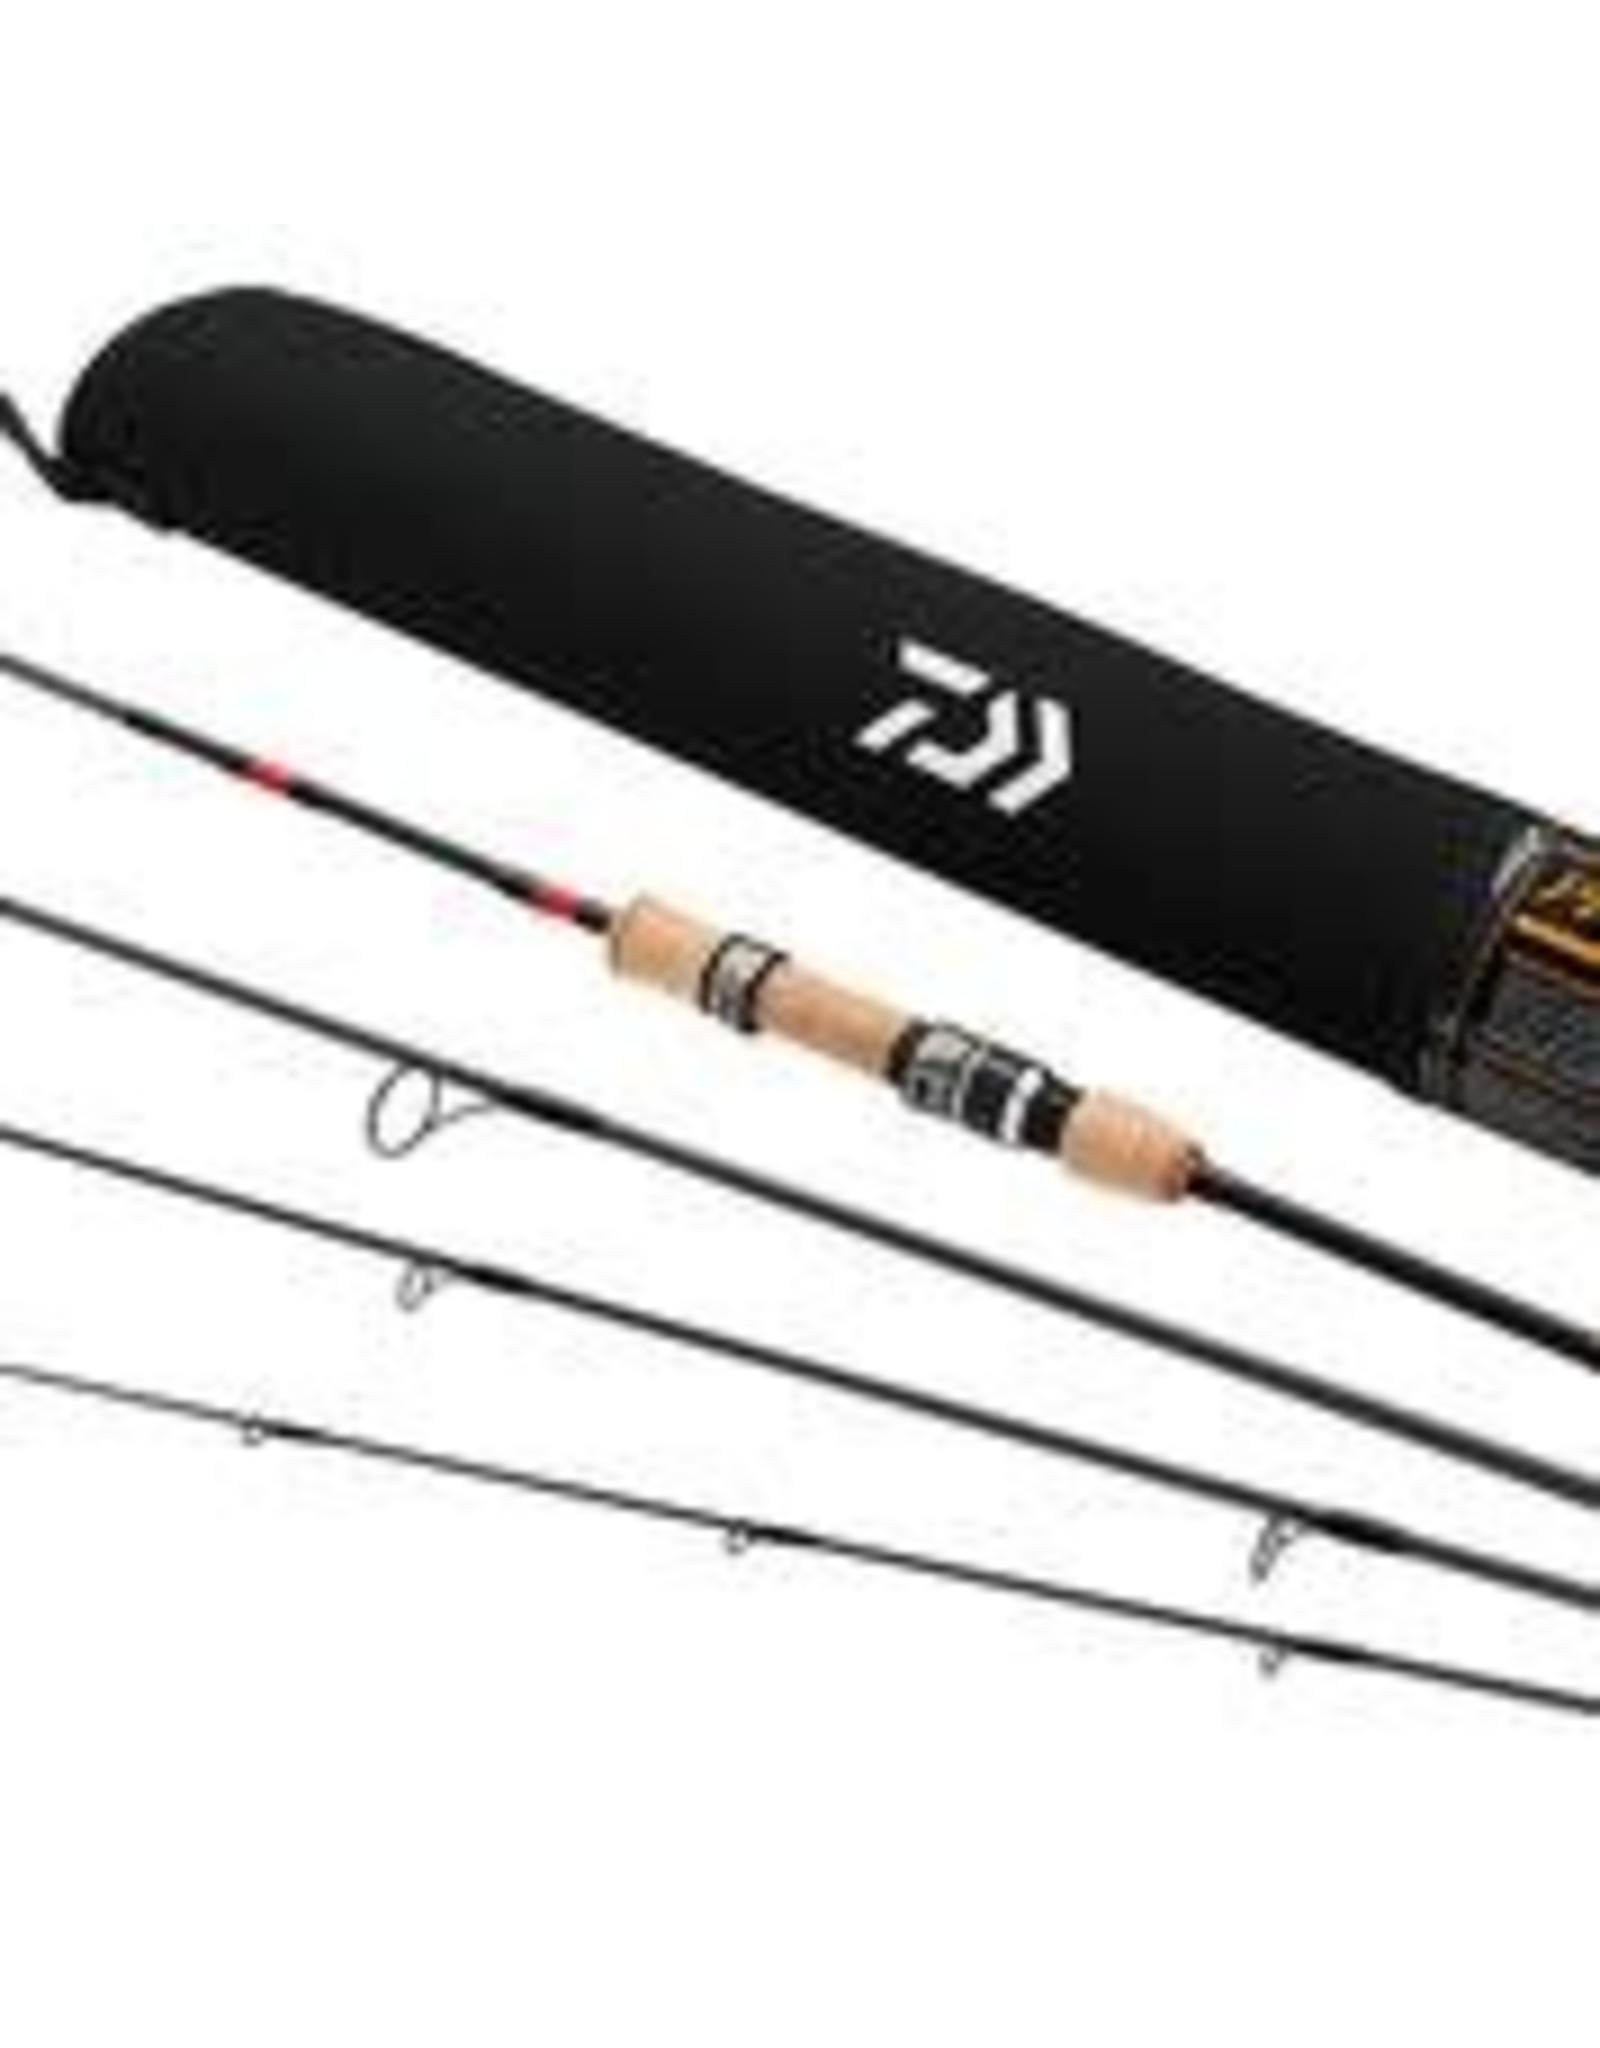 Daiwa Daiwa Presso Spinning Rod